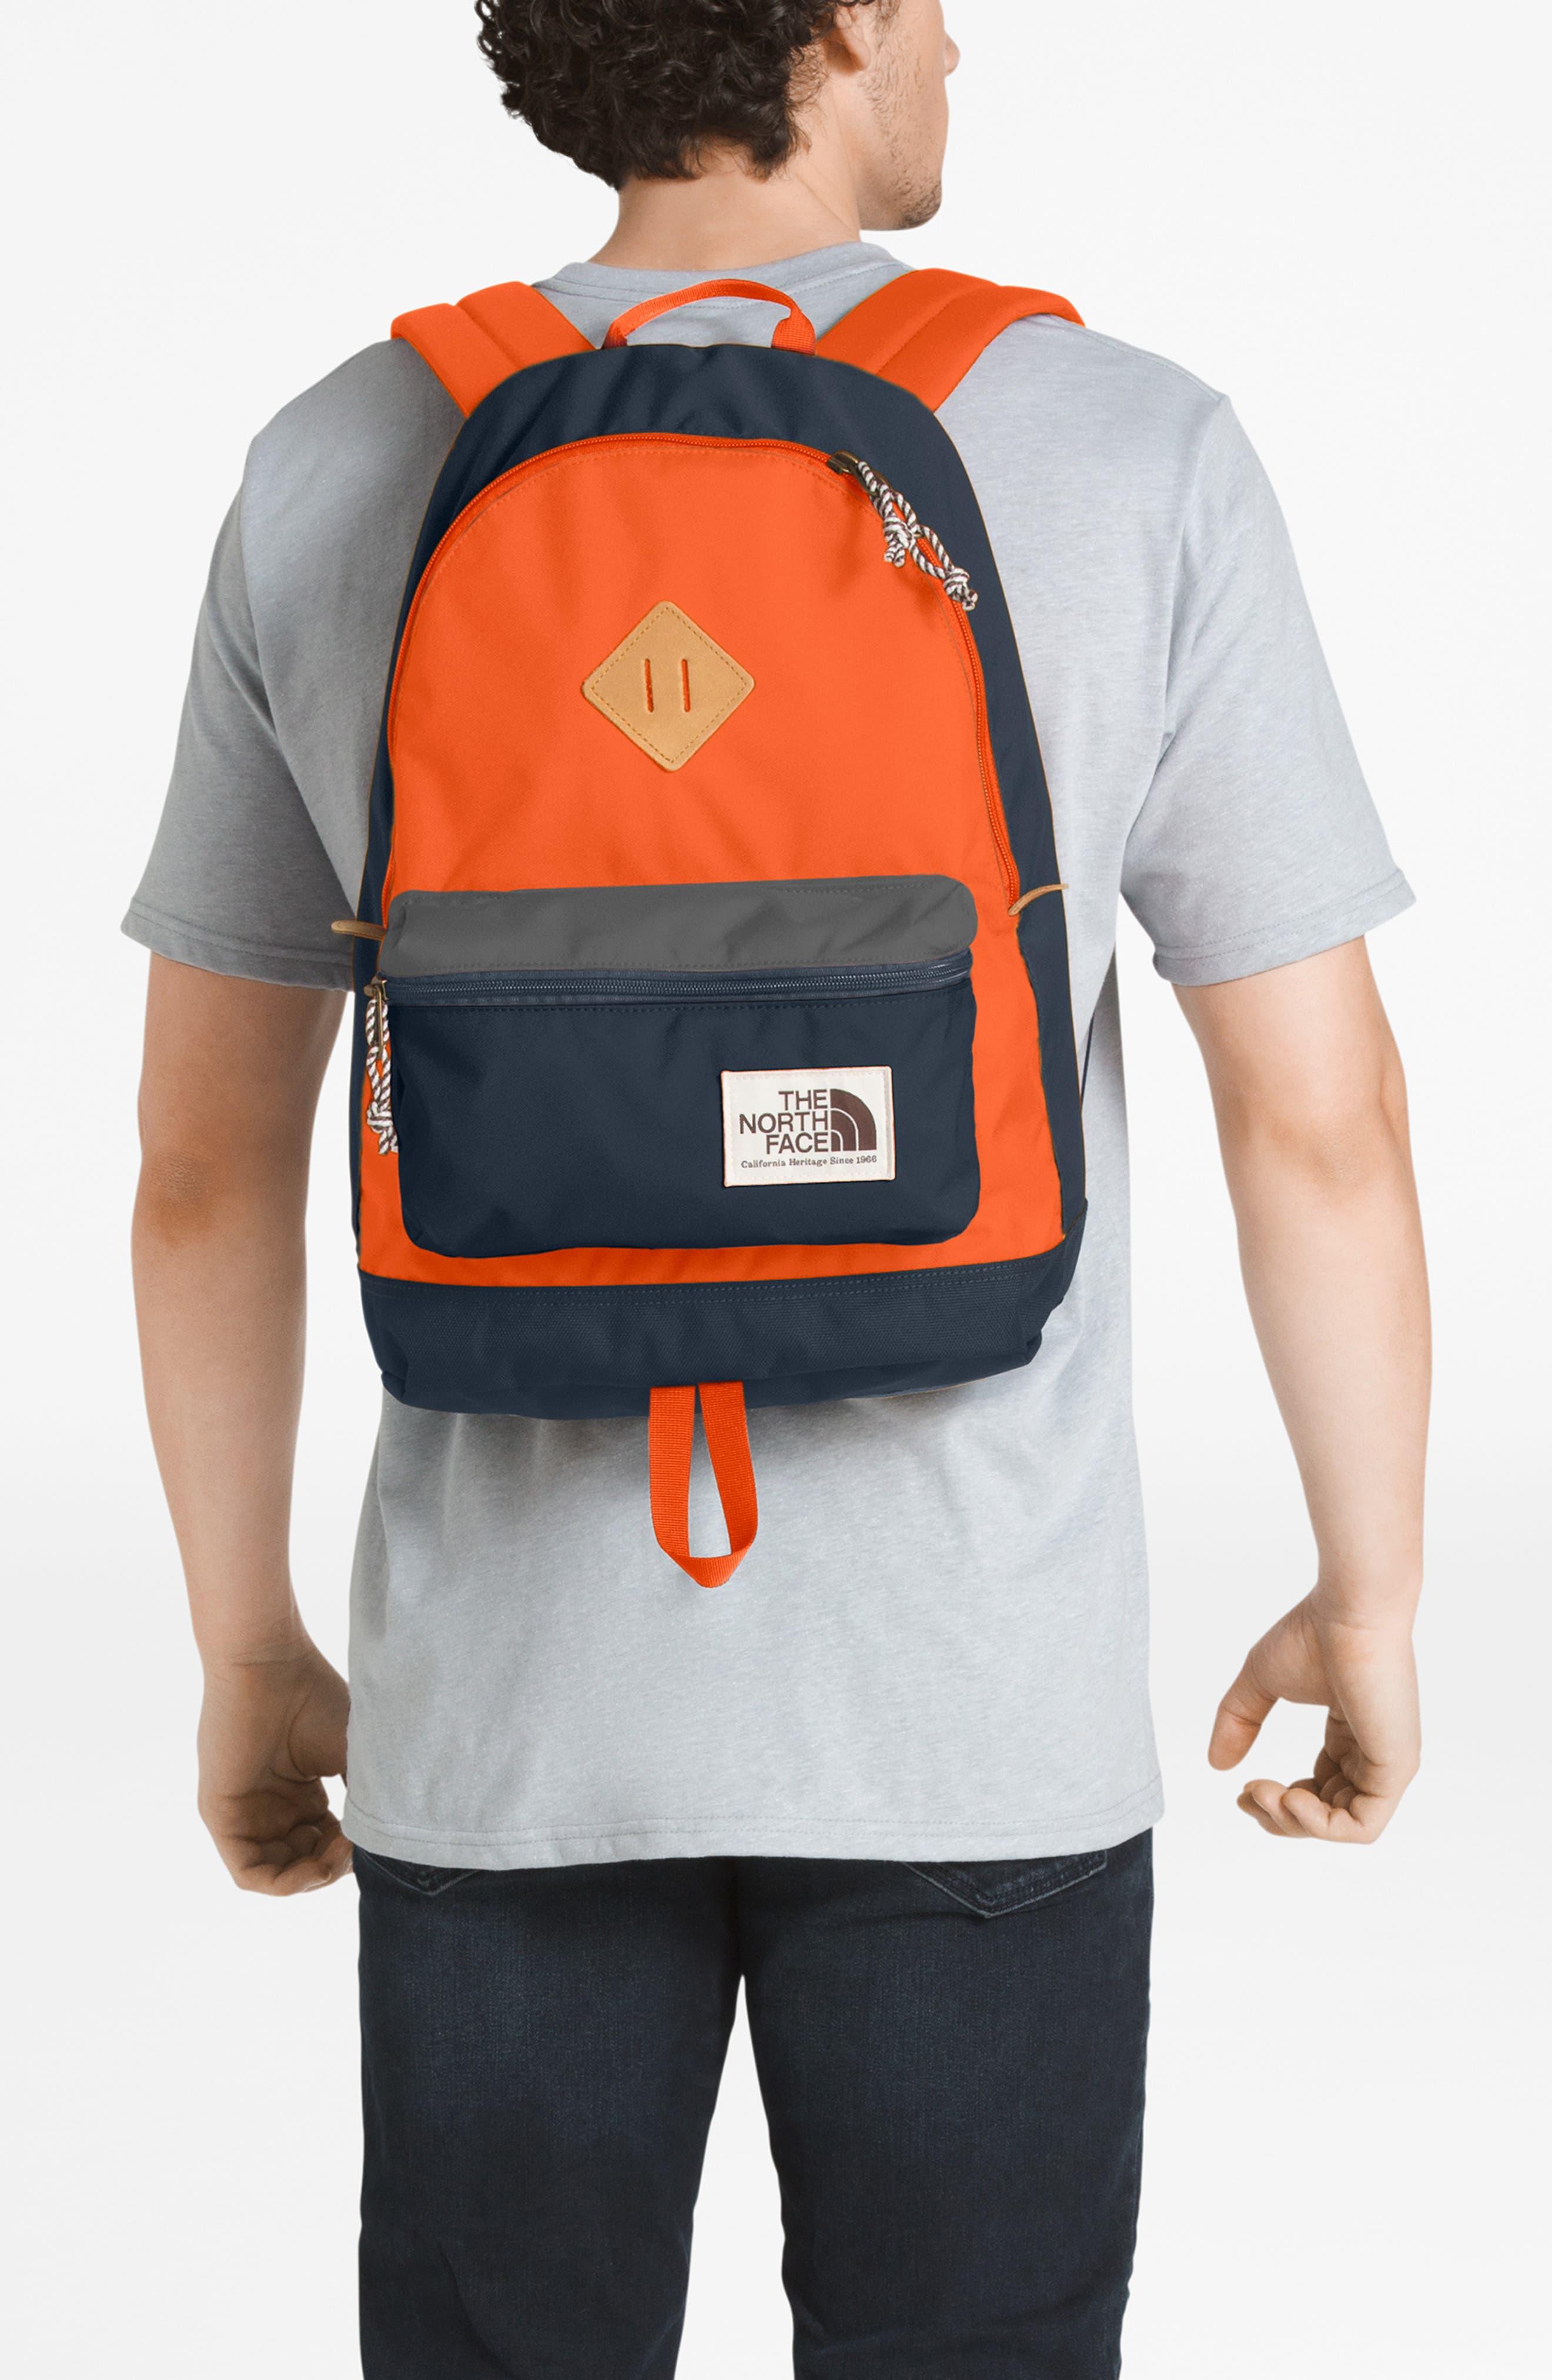 THE NORTH FACE,                             Berkeley 25-Liter Backpack,                             Main thumbnail 1, color,                             URBAN NAVY/PERSIAN ORANGE